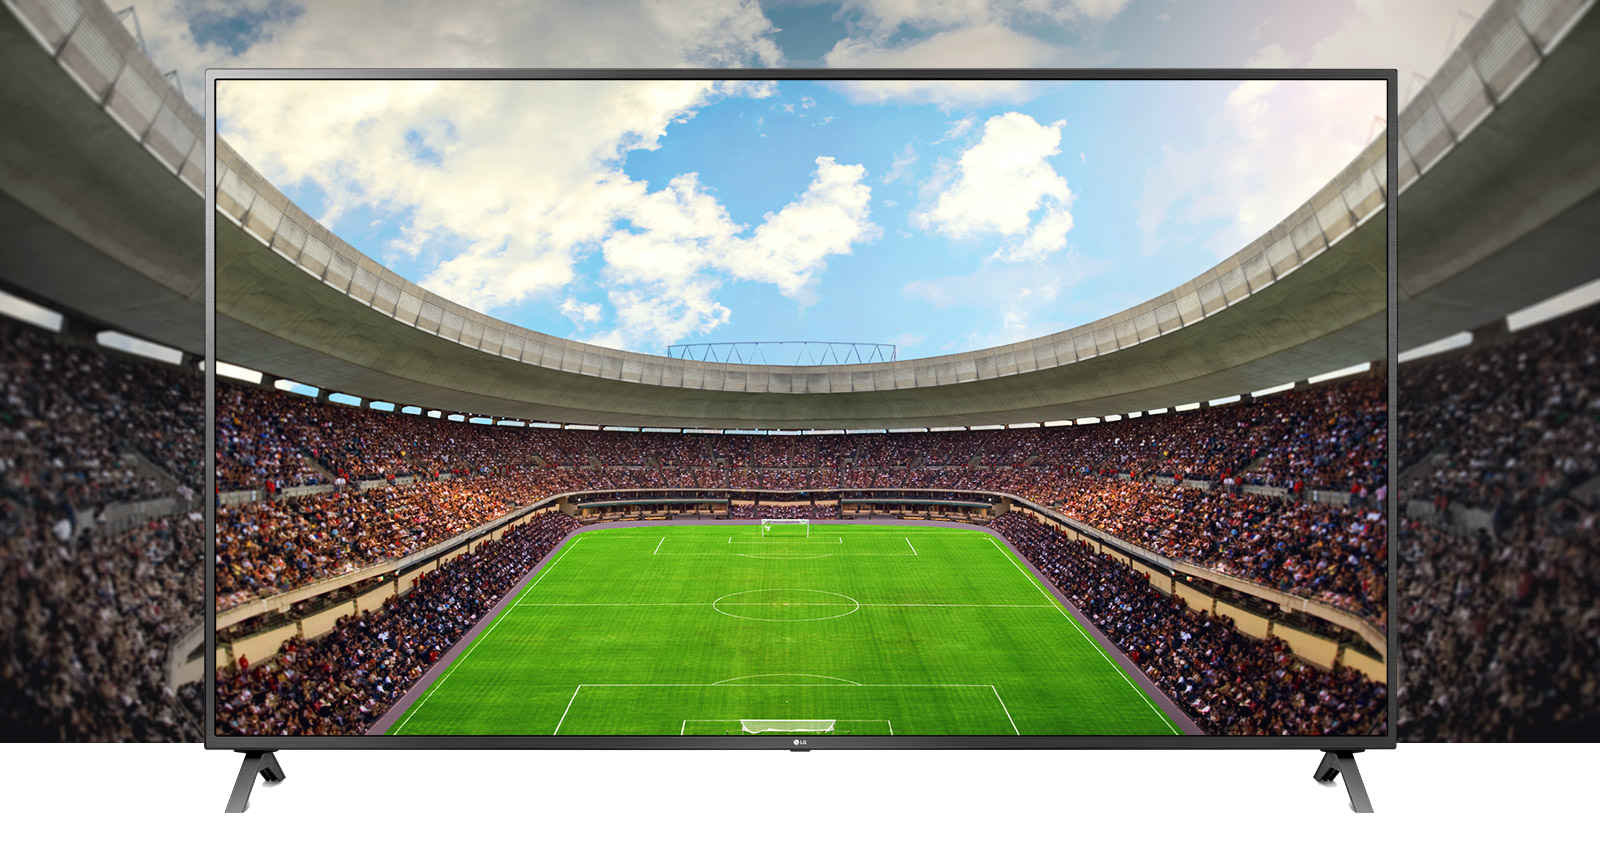 Telewizor LG LED 65UN74003LB - Telewizor